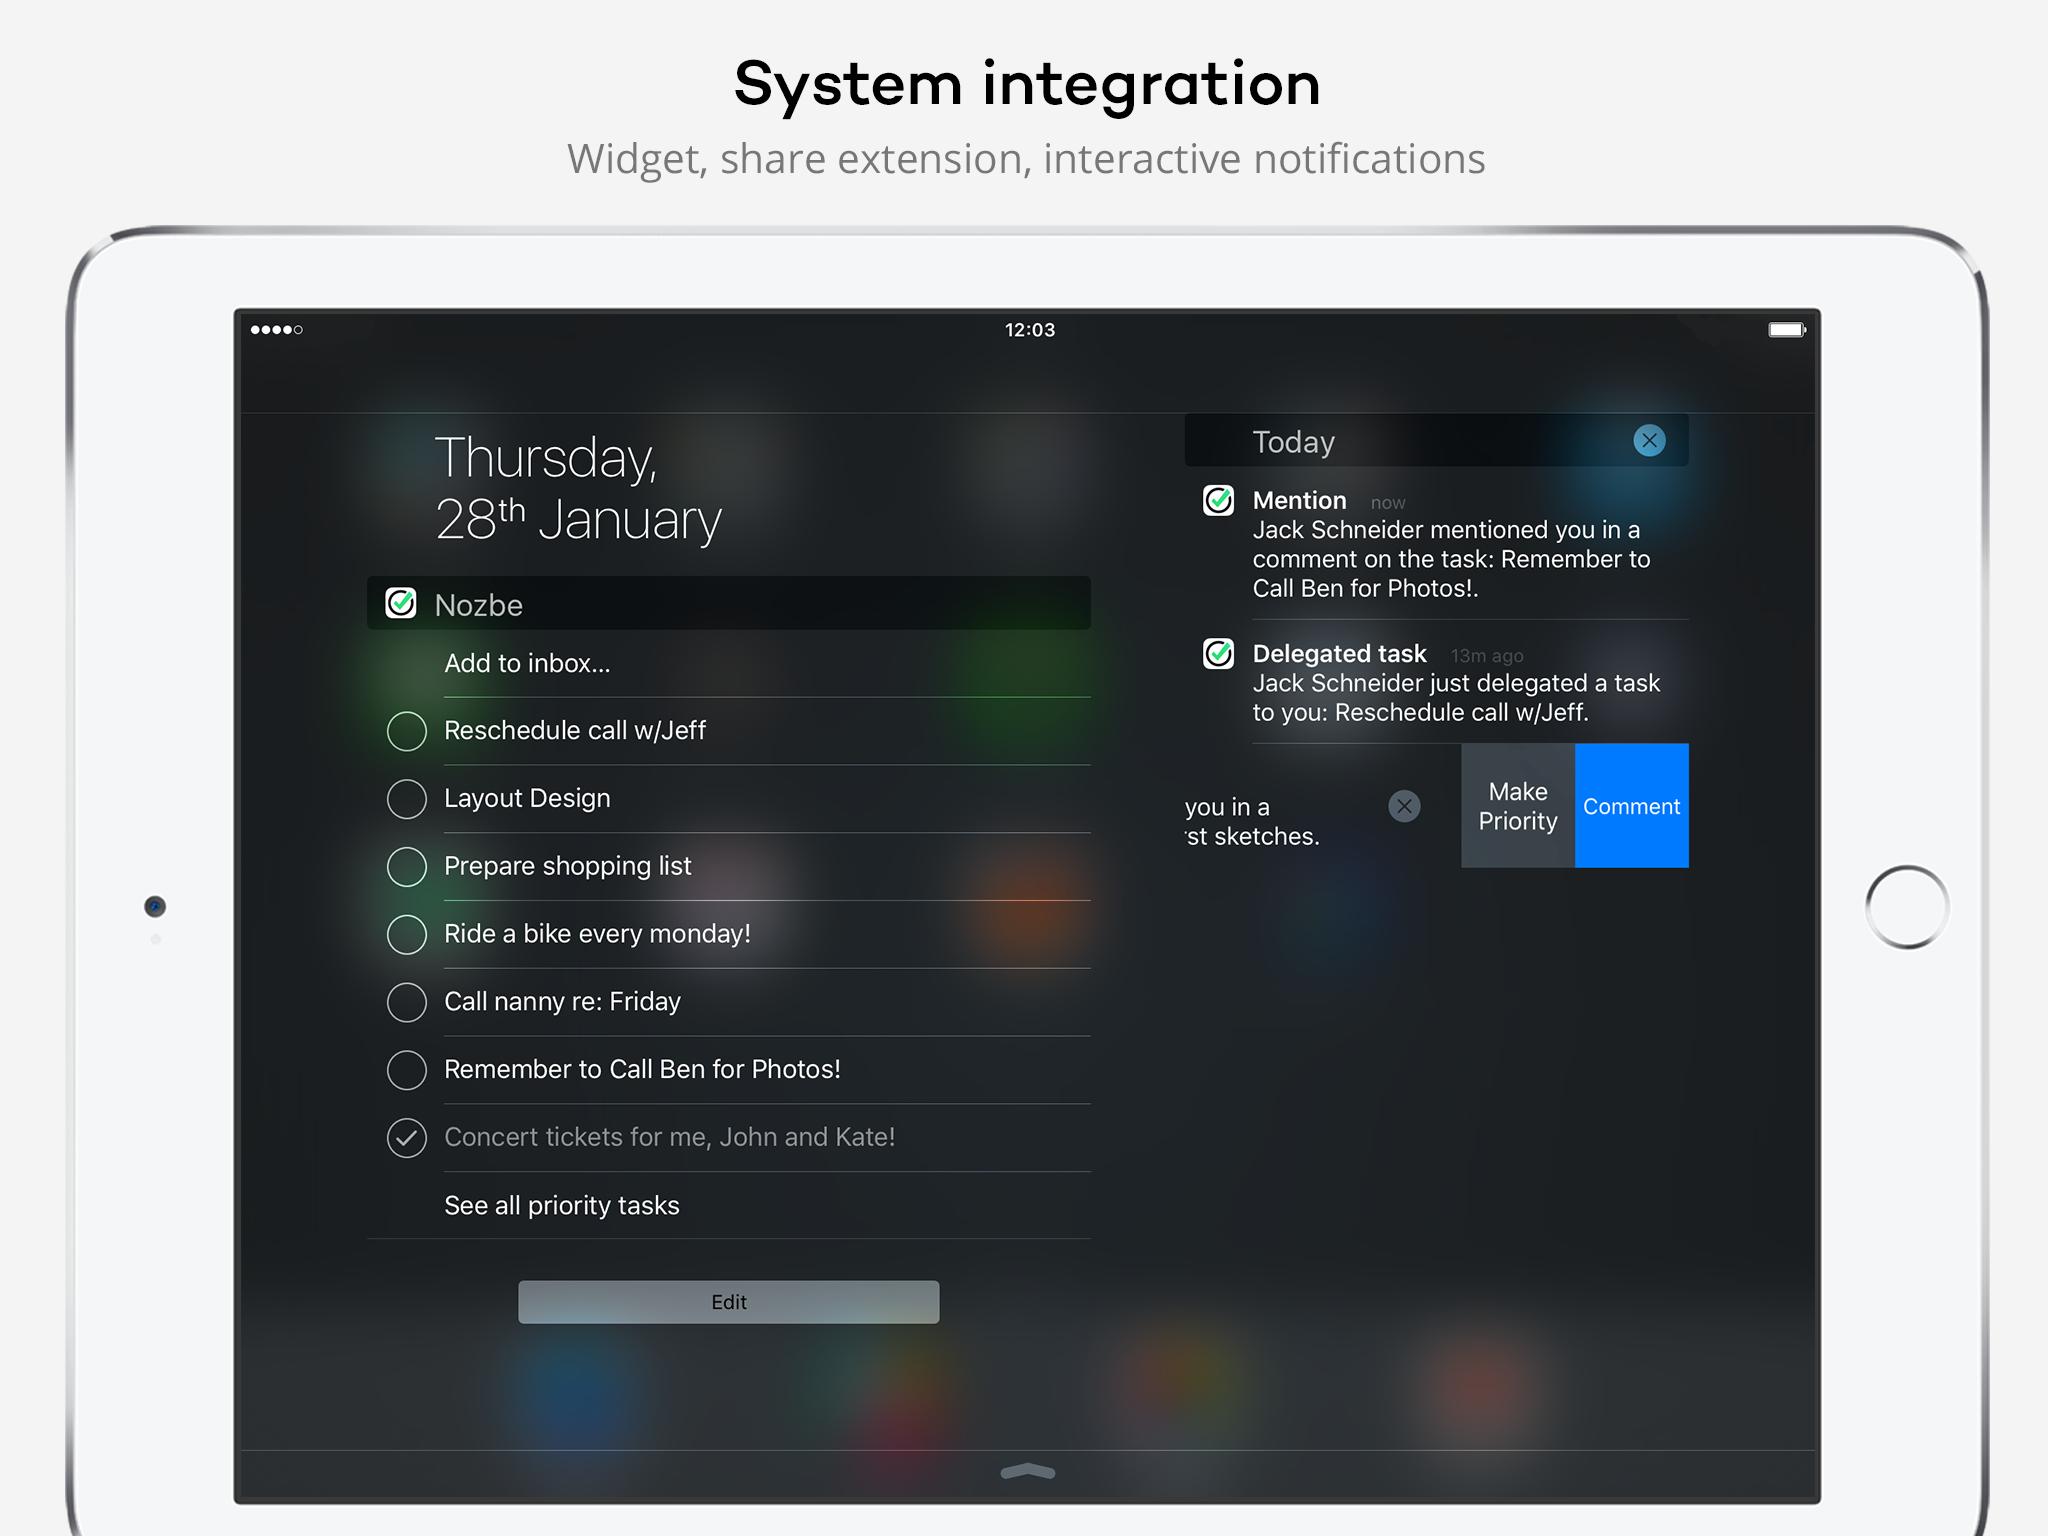 Nozbe - iPad - English - Evernote App Center